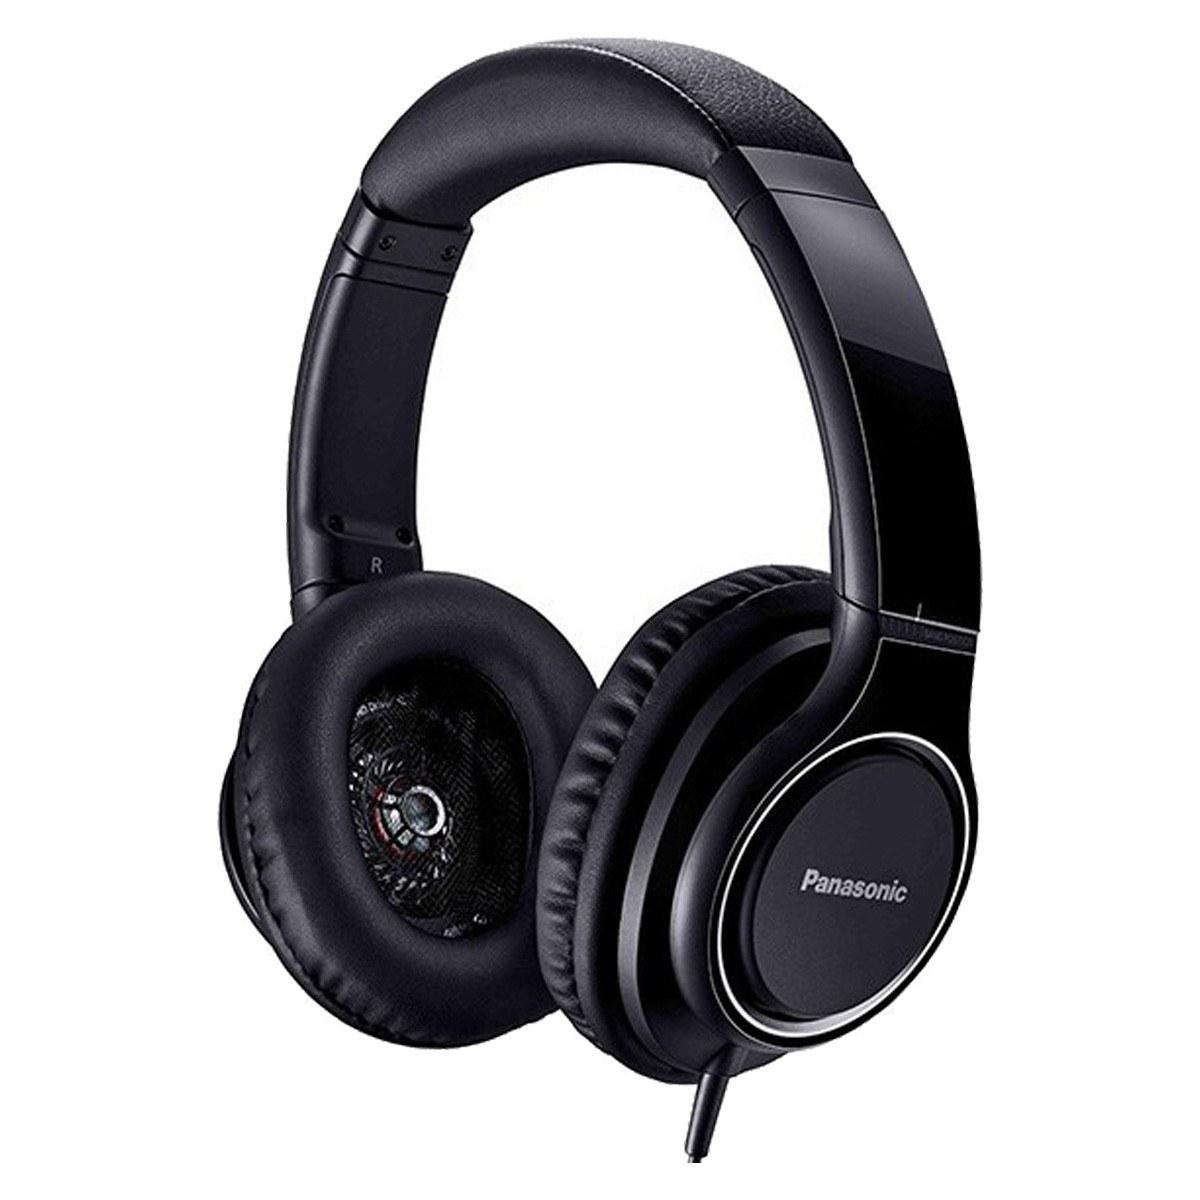 هدفون پاناسونيک Panasonic Technics RP-HD5 Headphone